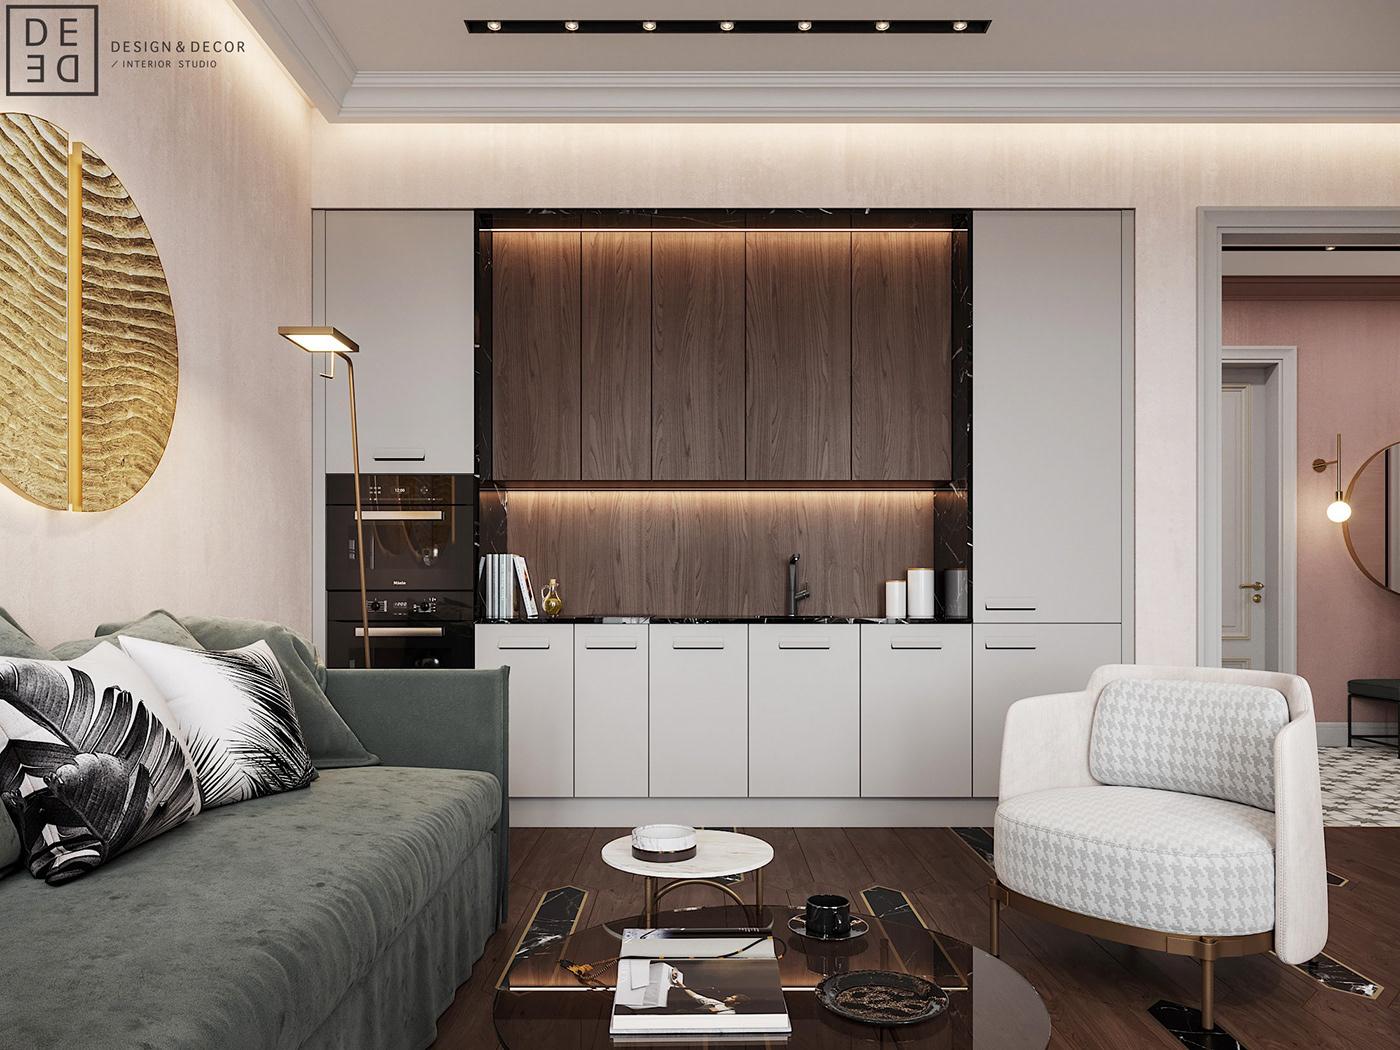 design DE&DE apartment Interior CoronaRender  DE&DE Interior Studio